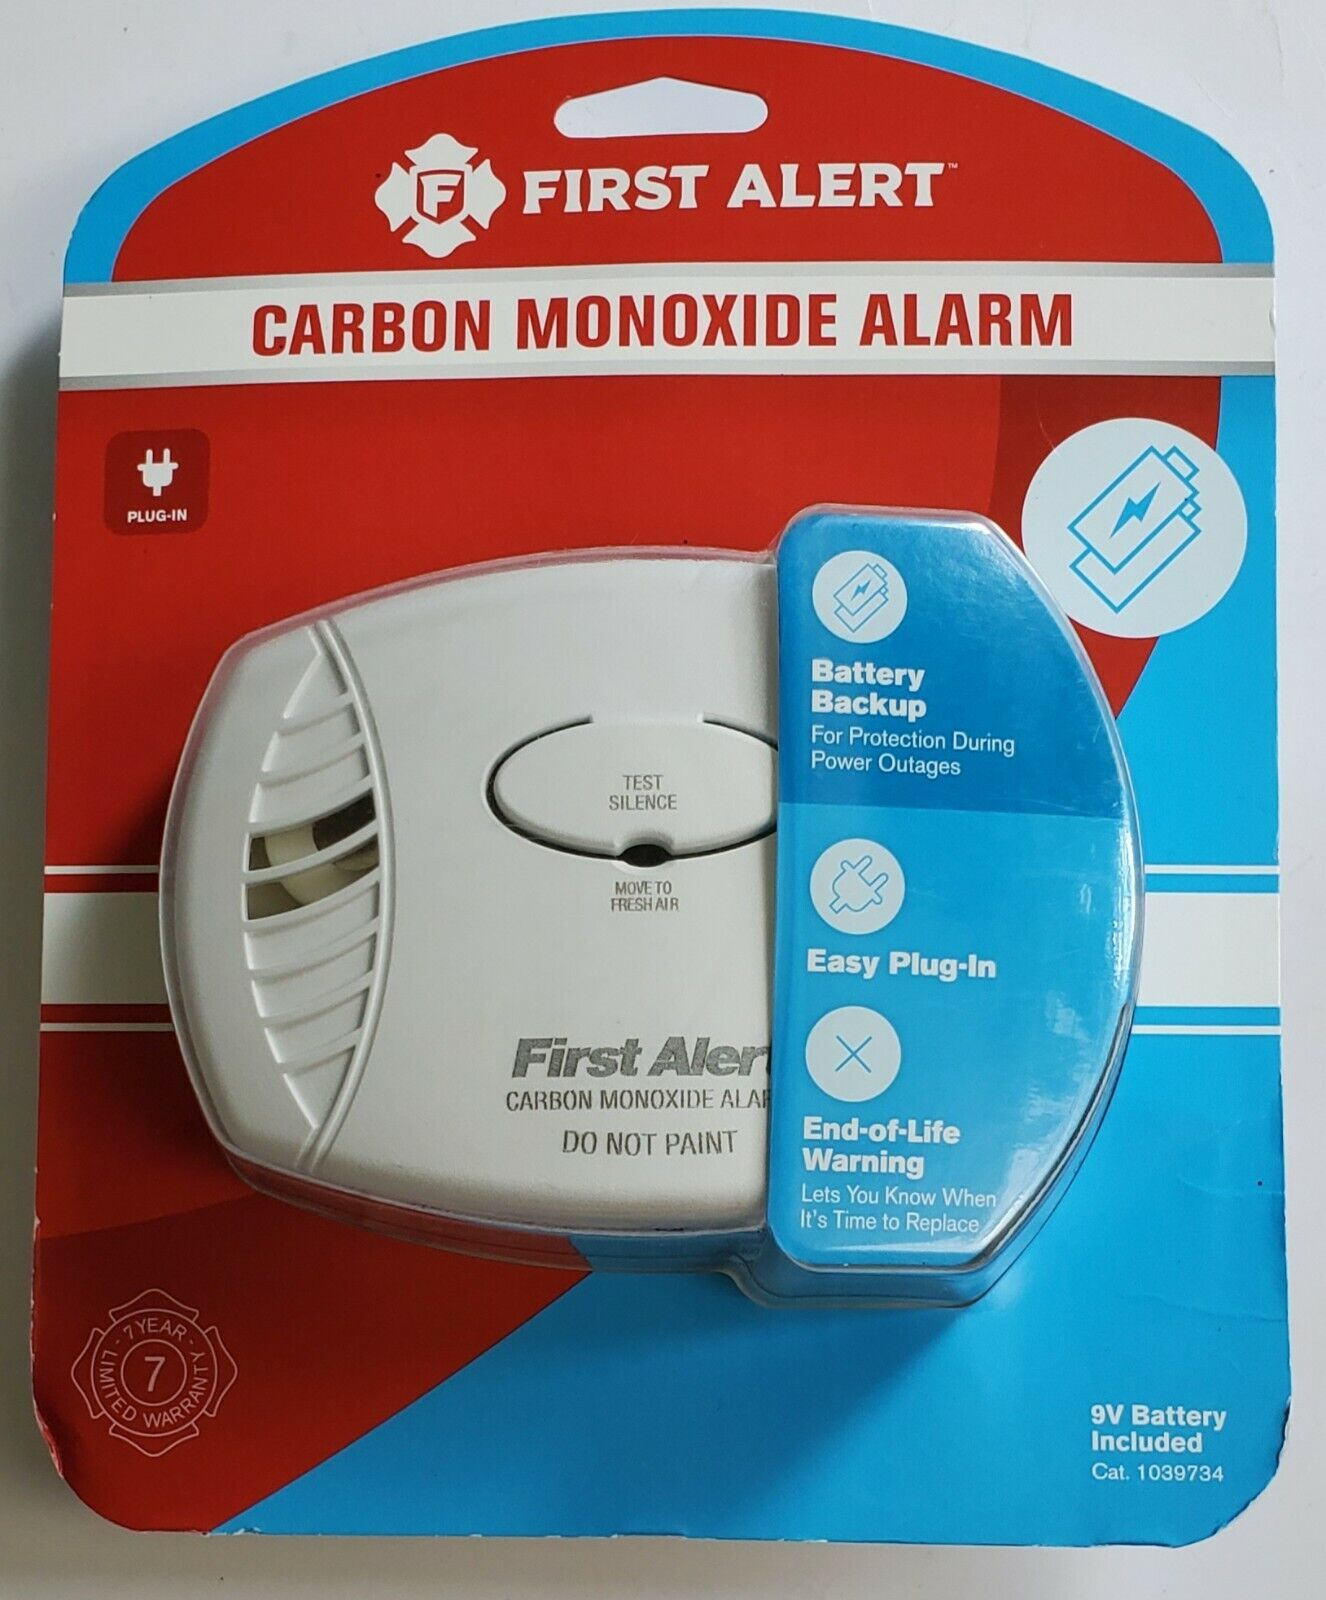 First Alert FAT1039734 Plug-in Carbon Monoxide Alarm with Ba